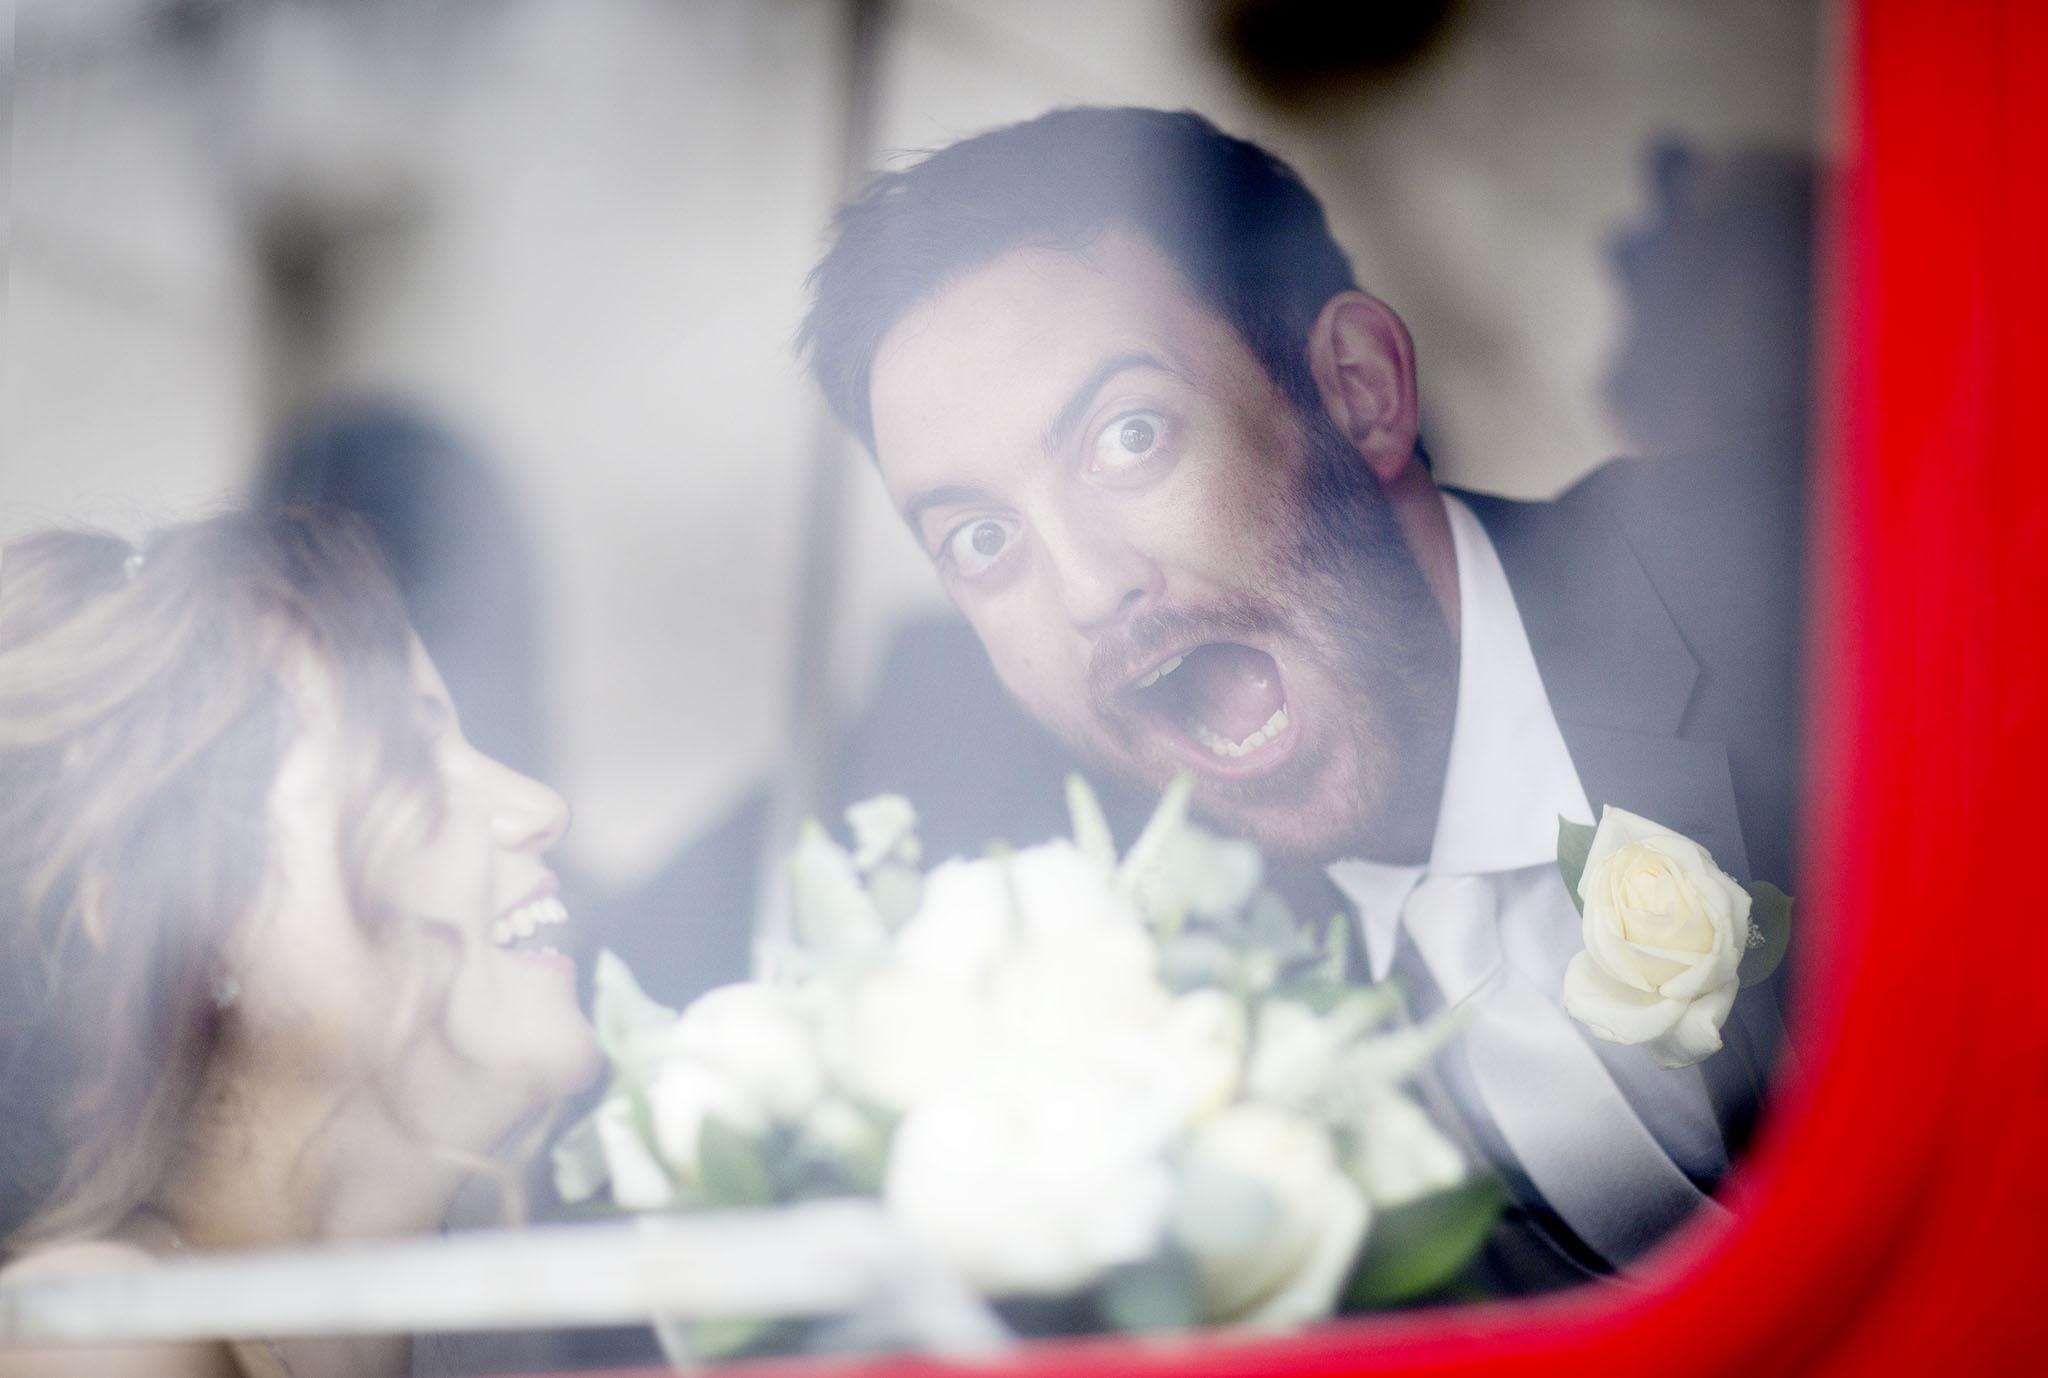 elizabethgphotography_kingslangley_hertfordshire_fineart_wedding_enfield_ricky_nicole_nahlis_27.jpg